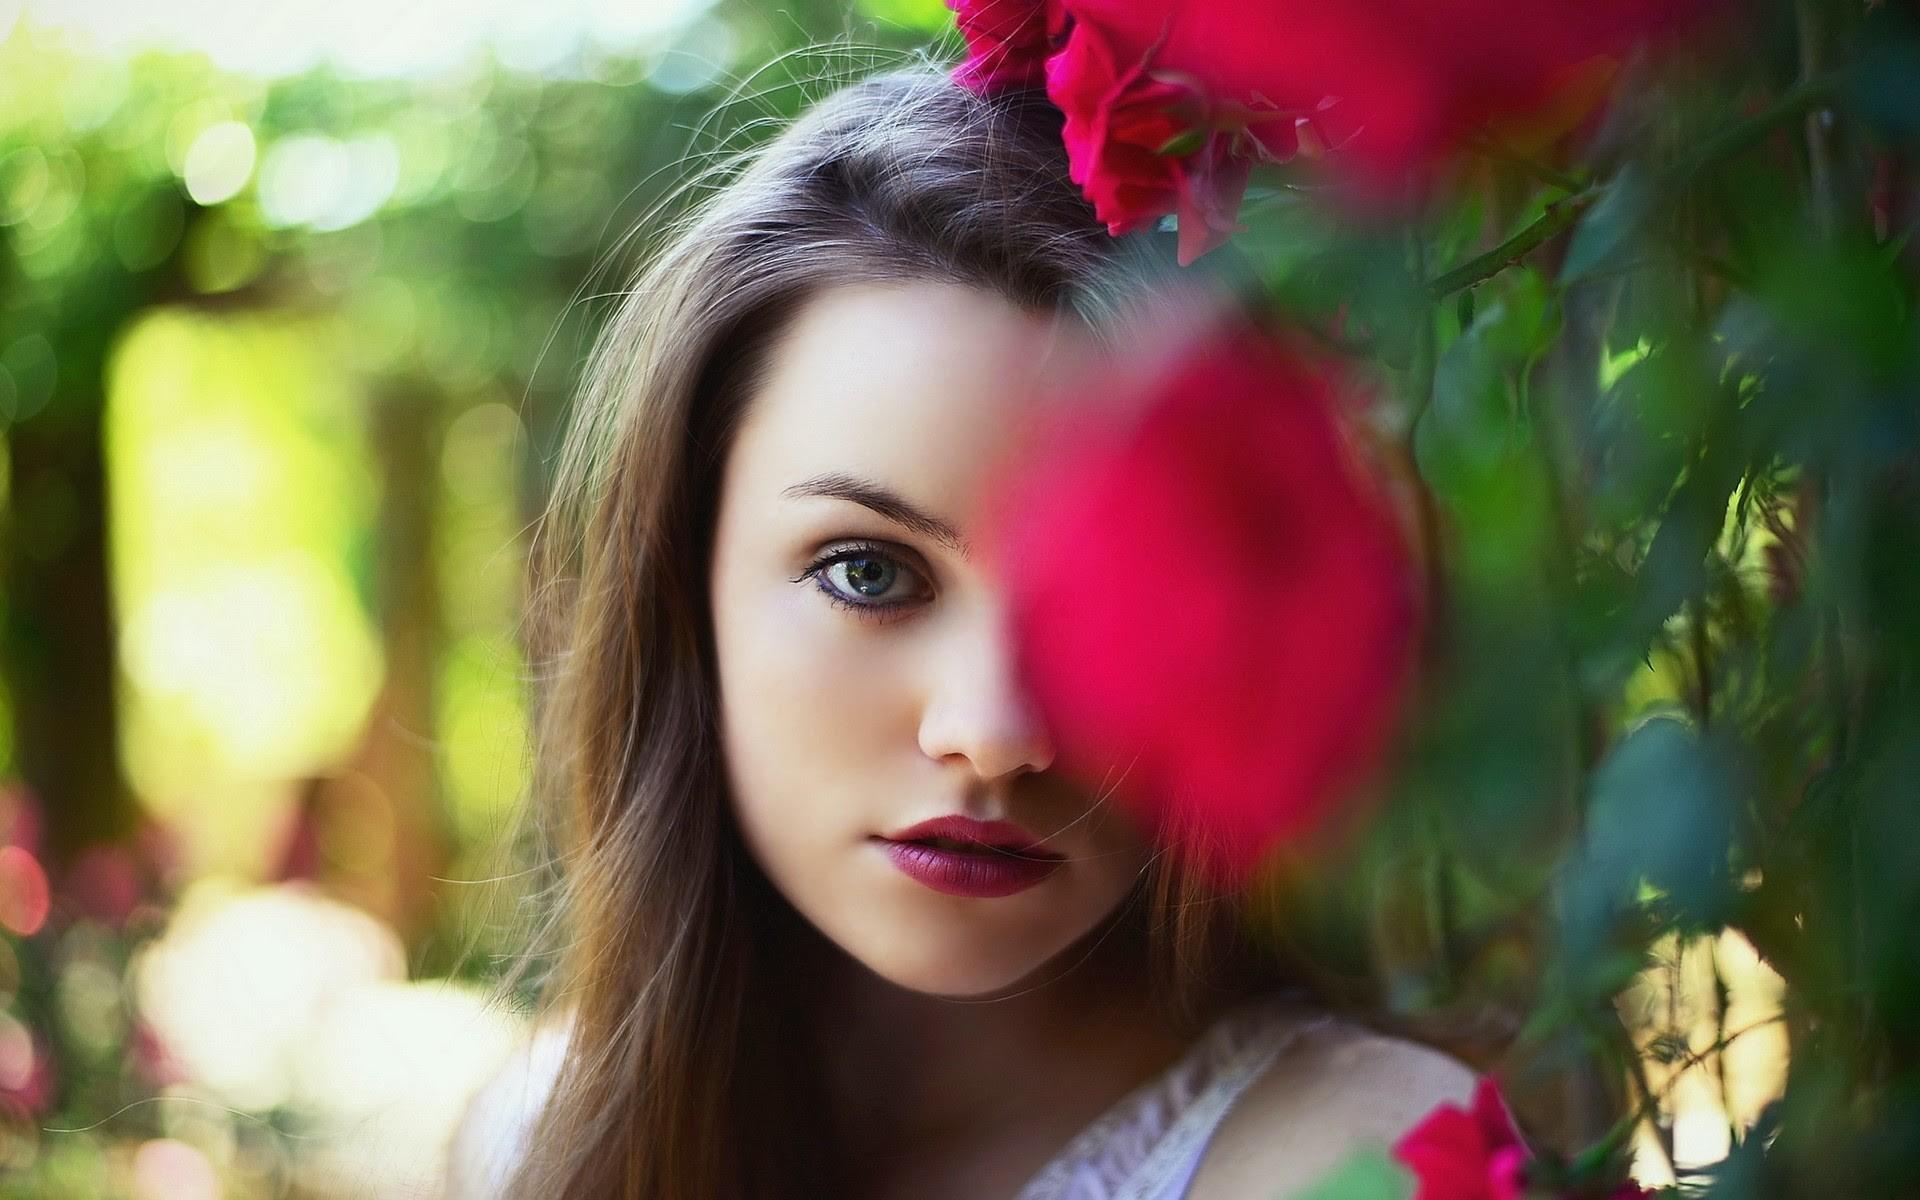 Wallpaper : face, women, model, flowers, long hair, blue